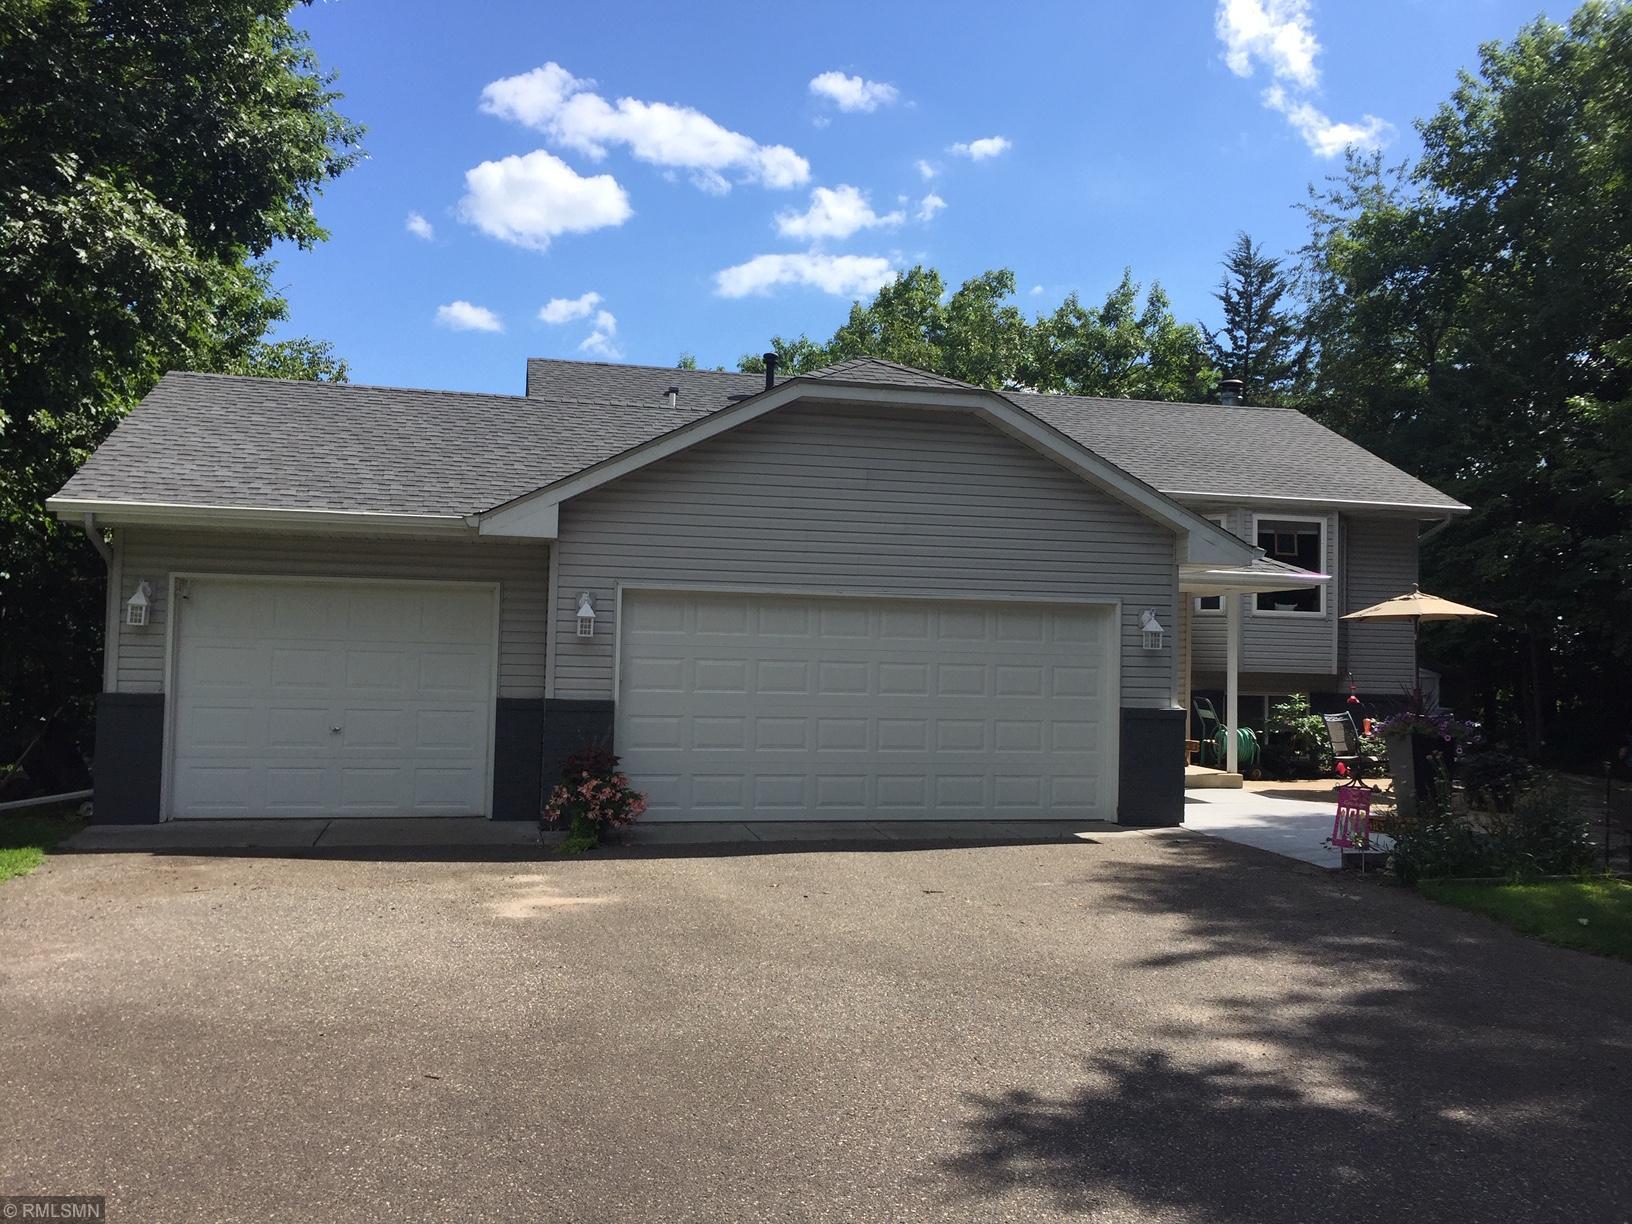 30555 Wallmark Lake Drive Property Photo - Chisago City, MN real estate listing